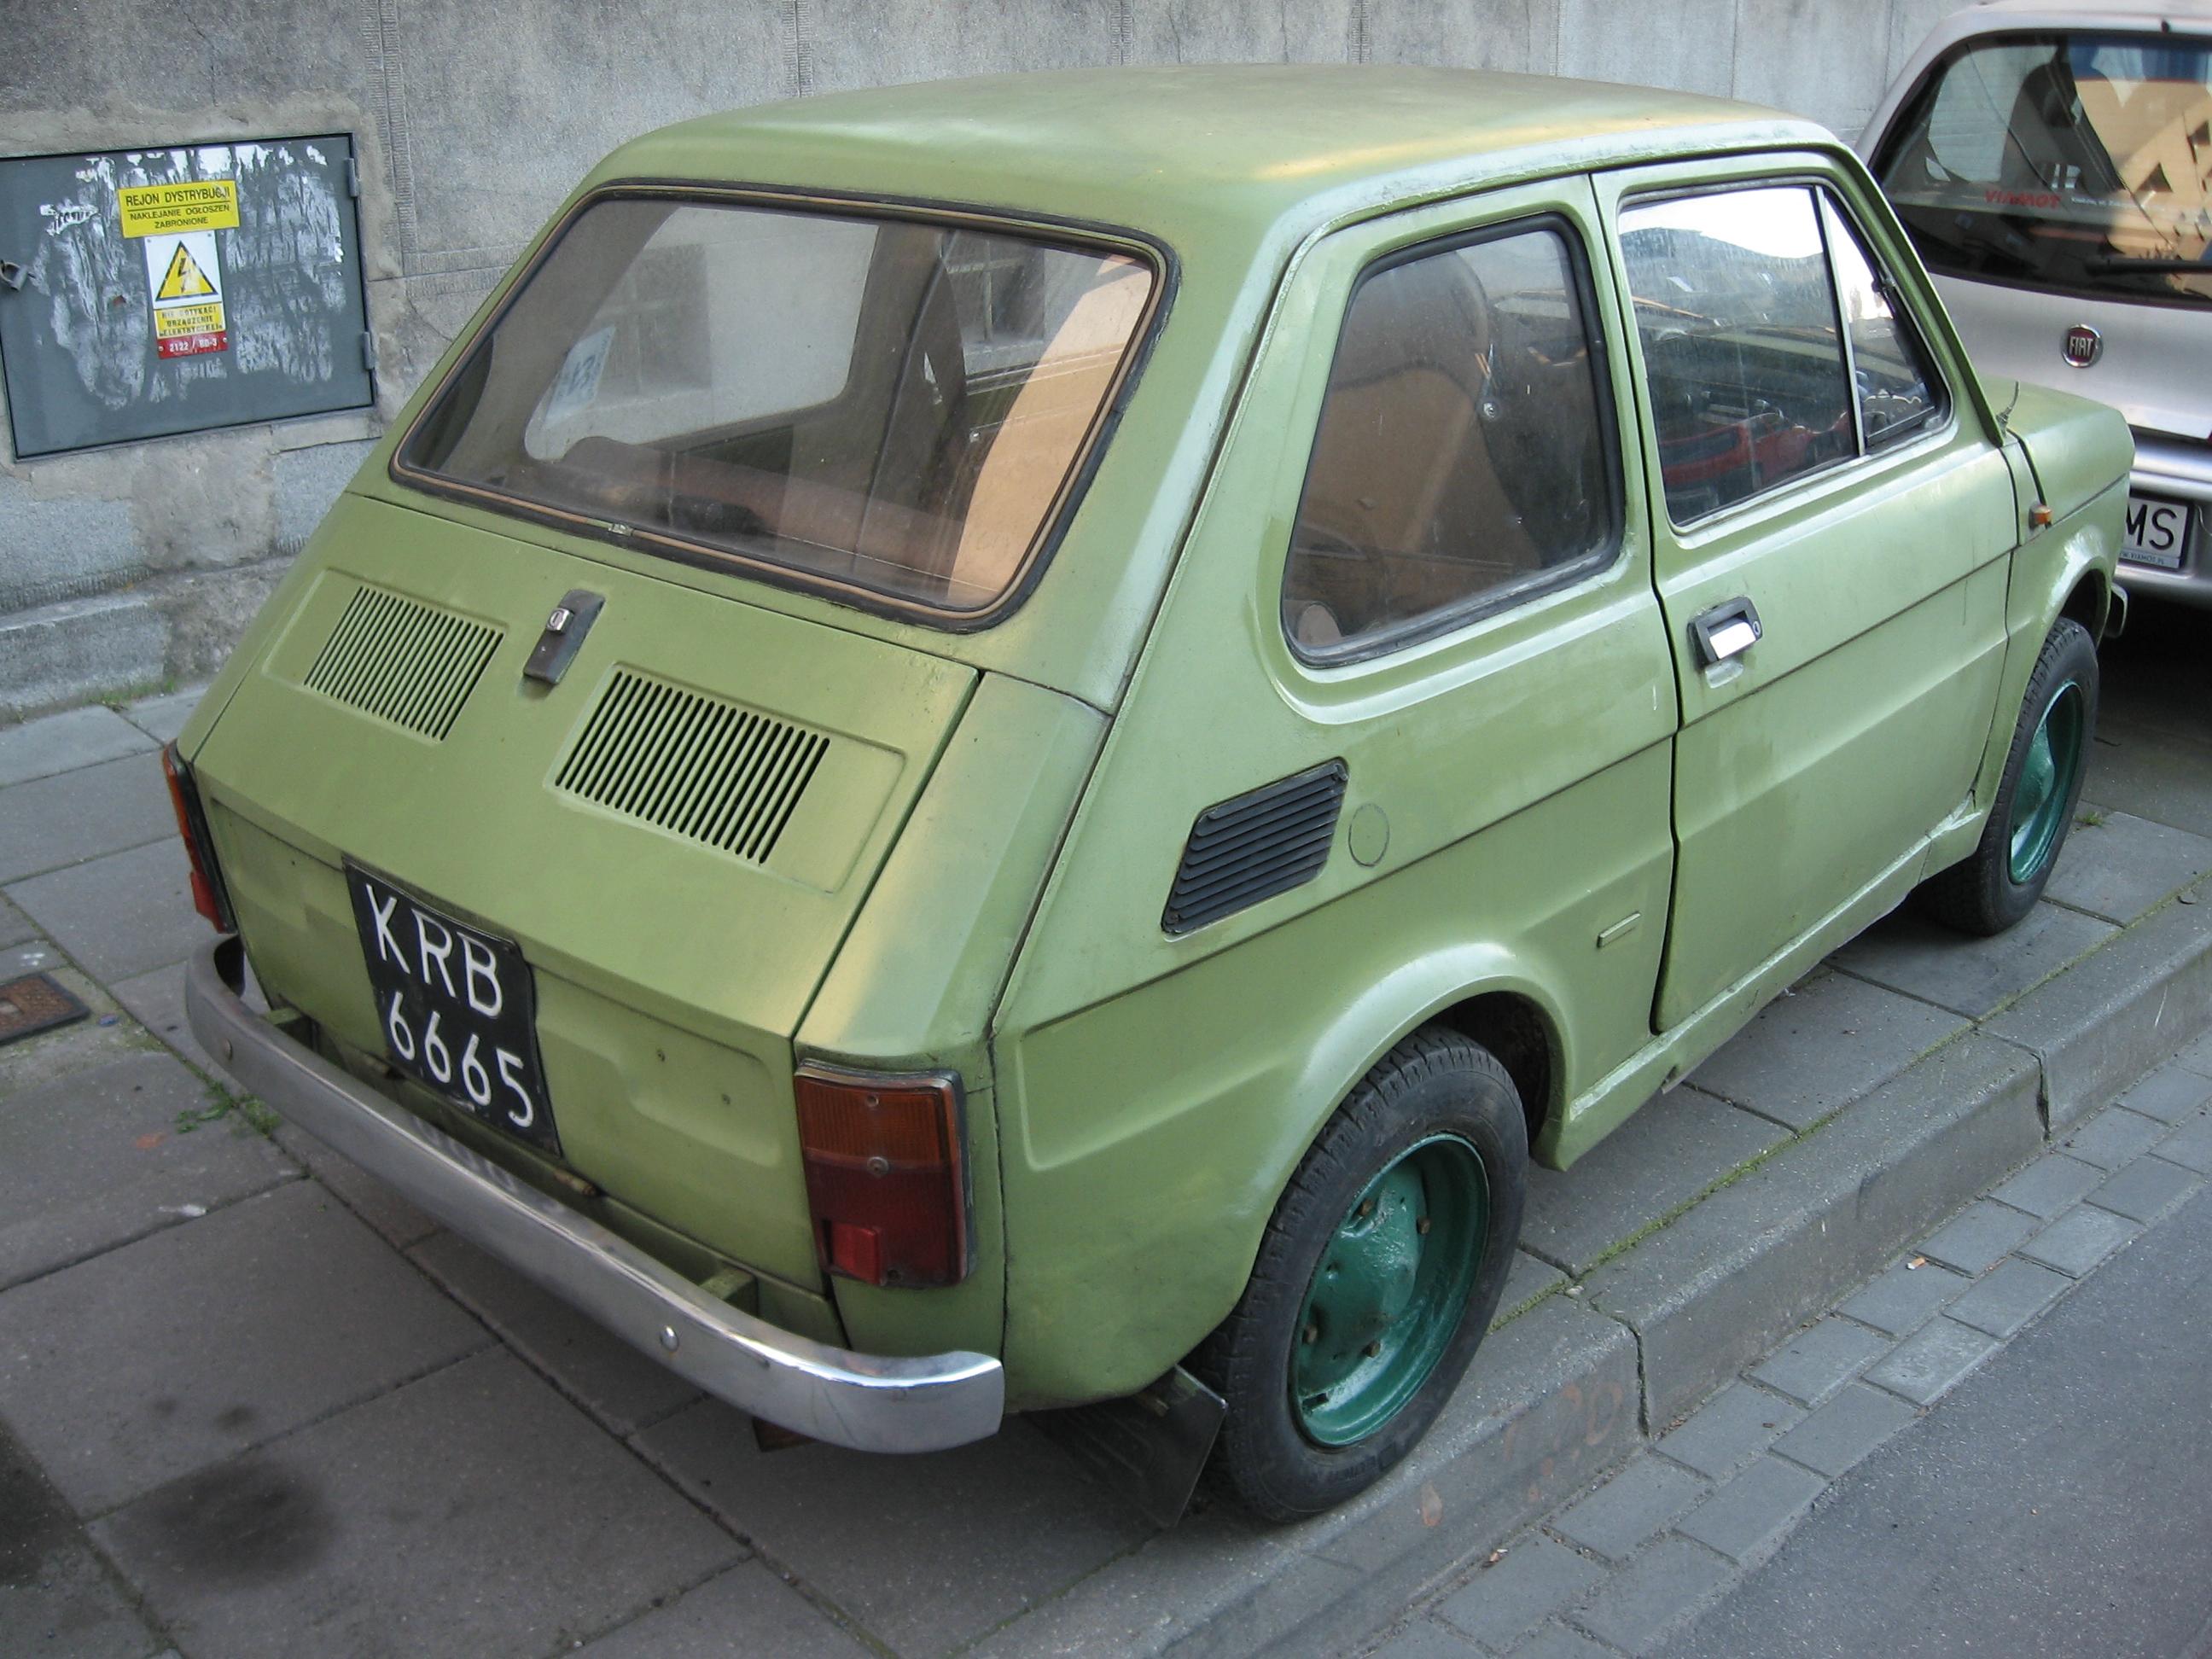 file green polski fiat 126p produced between 1973 and 1978. Black Bedroom Furniture Sets. Home Design Ideas